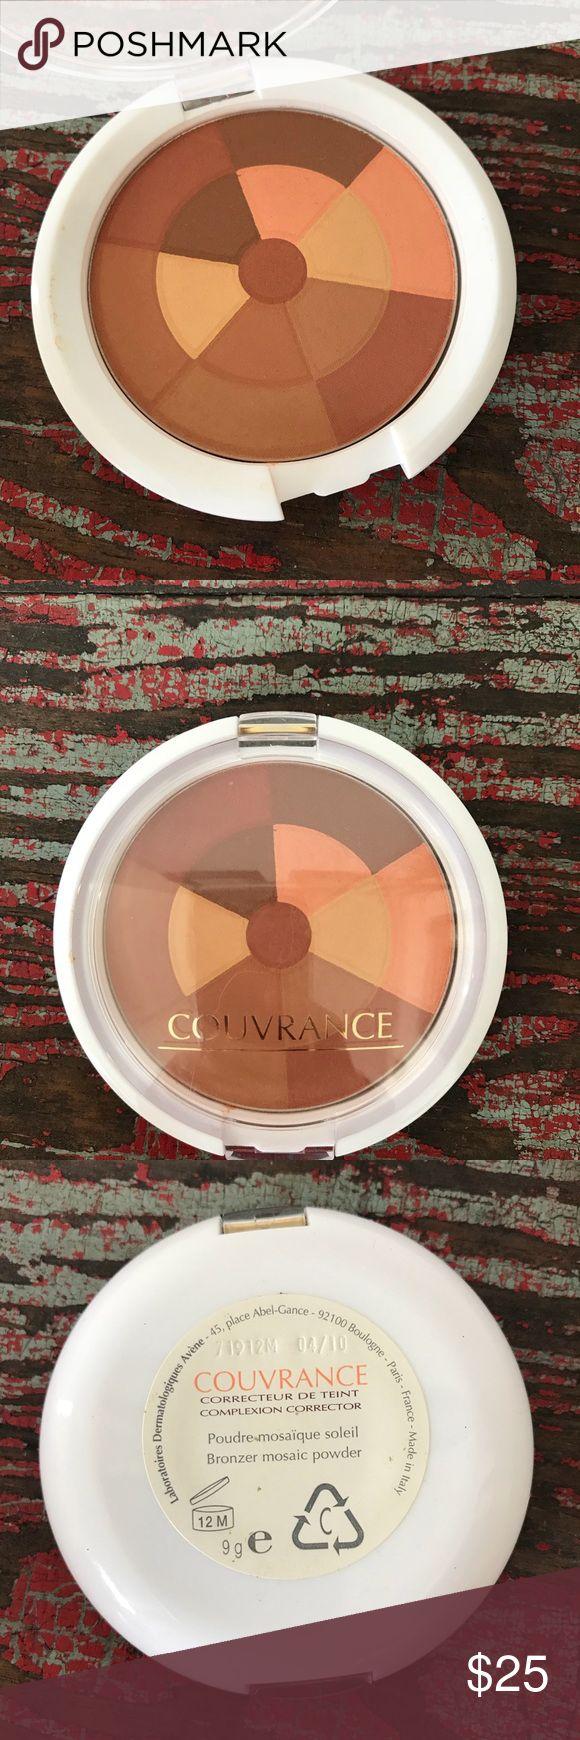 Avene Couvrance Bronzer Mosiac Powder 9g New Avene Couvrance Complexion Corrector Bronzer Mosiac Powder. 9 grams Avene Makeup Bronzer